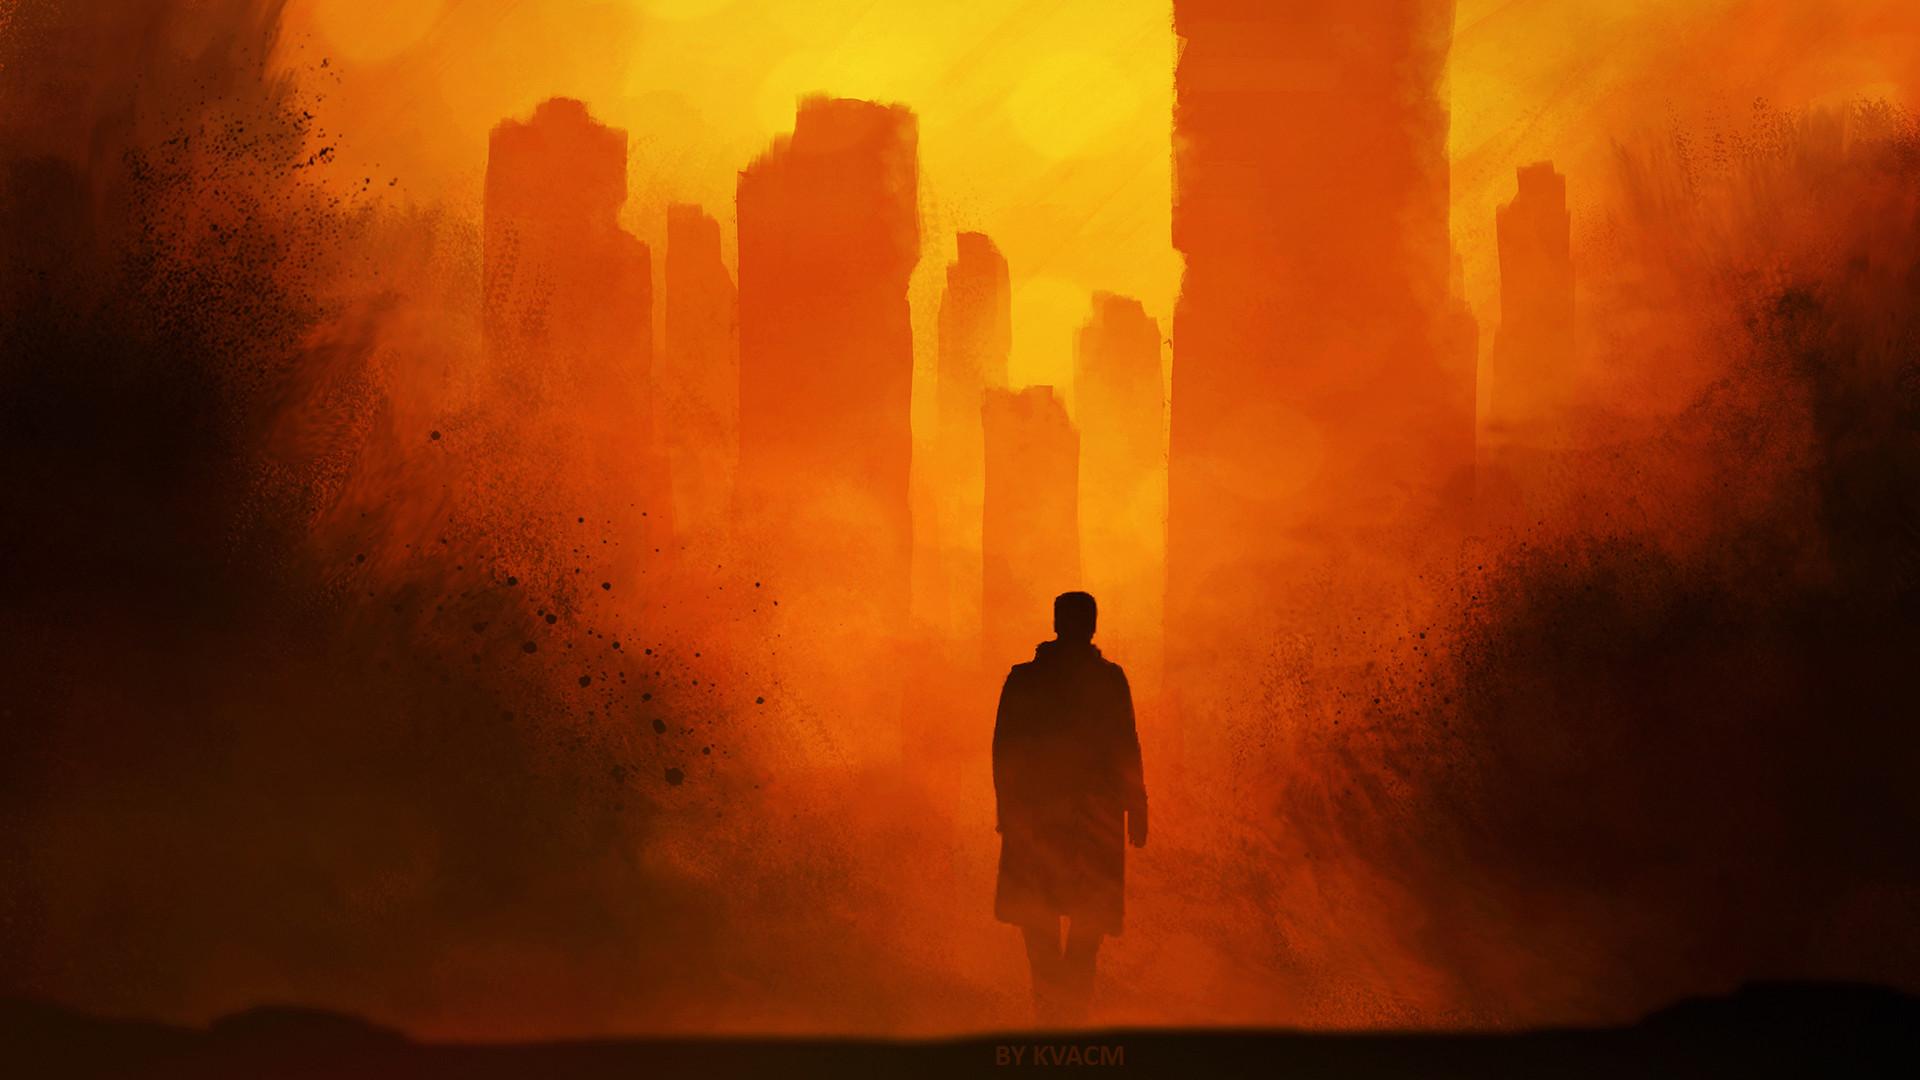 Blade Runner 2049 Art HD, HD Movies, 4k Wallpapers, Images ...